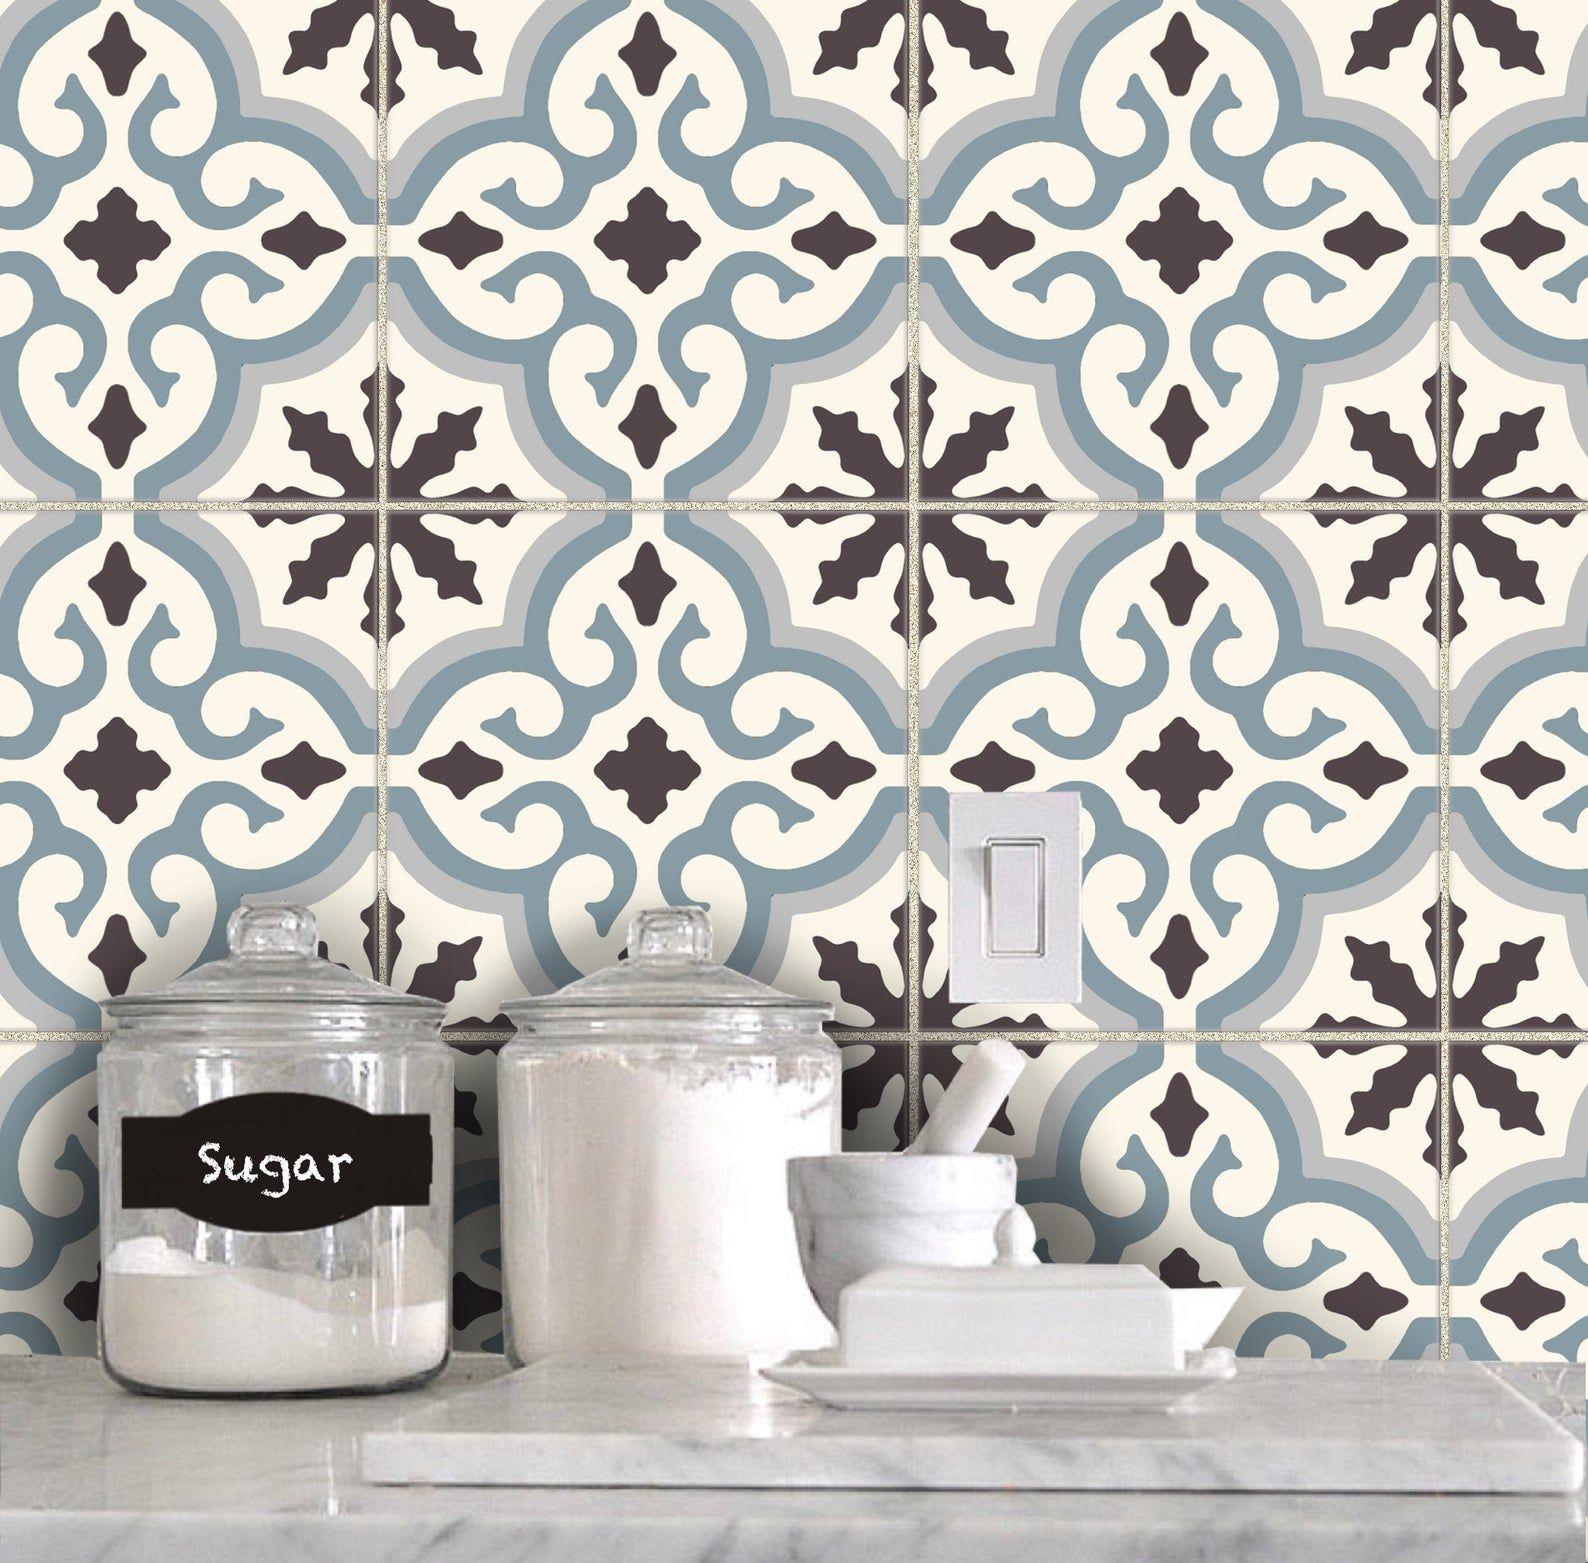 Tile Sticker Kitchen Bath Floor Wall Waterproof Removable Etsy In 2020 Tile Stickers Kitchen Wall Waterproofing Flooring